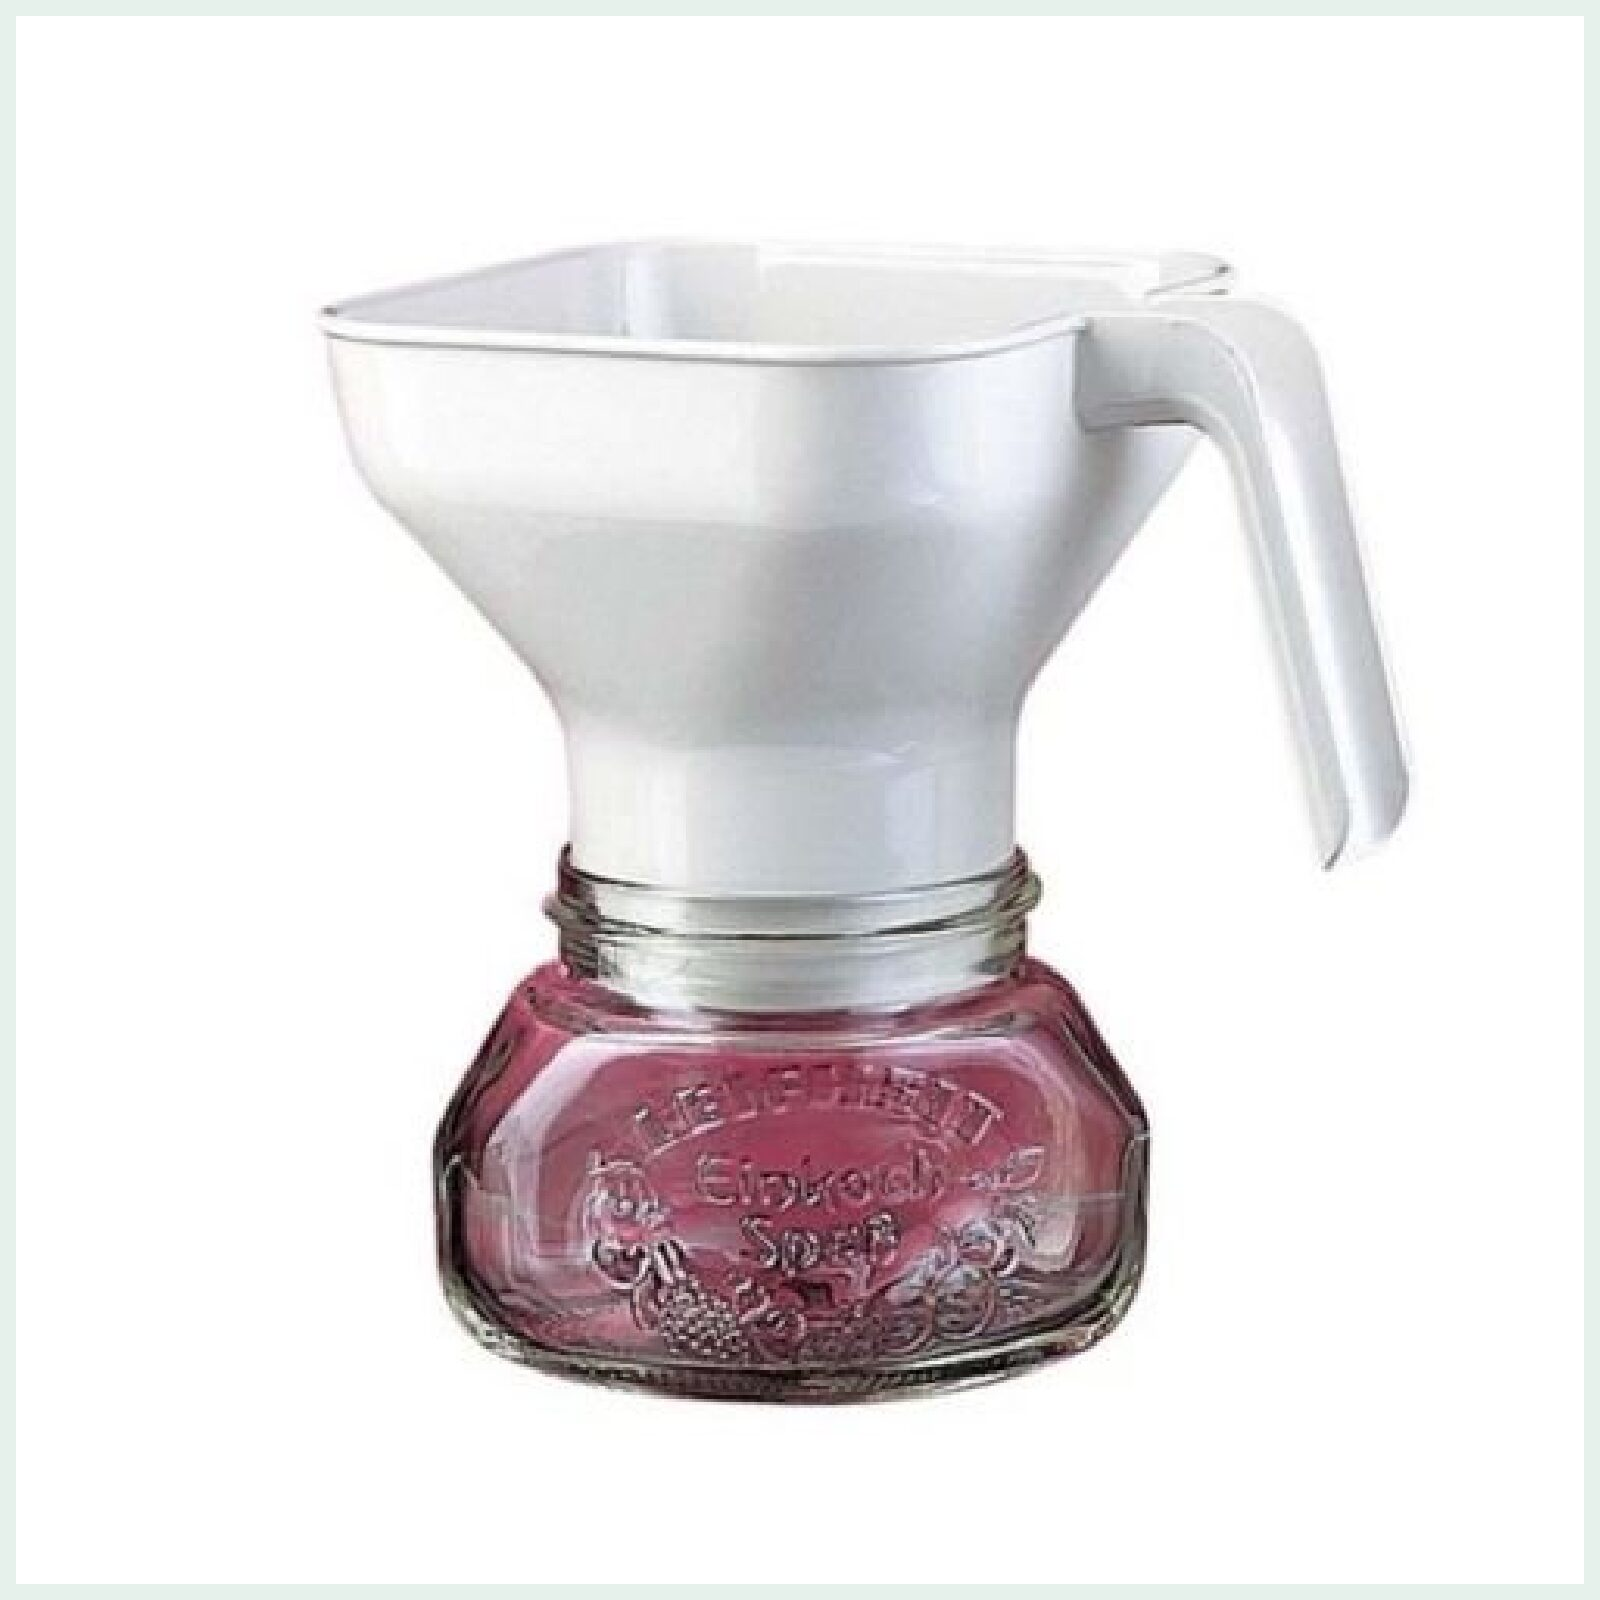 Leifheit large preserve jar funnel for easy filling of wide mouth preserve jars.